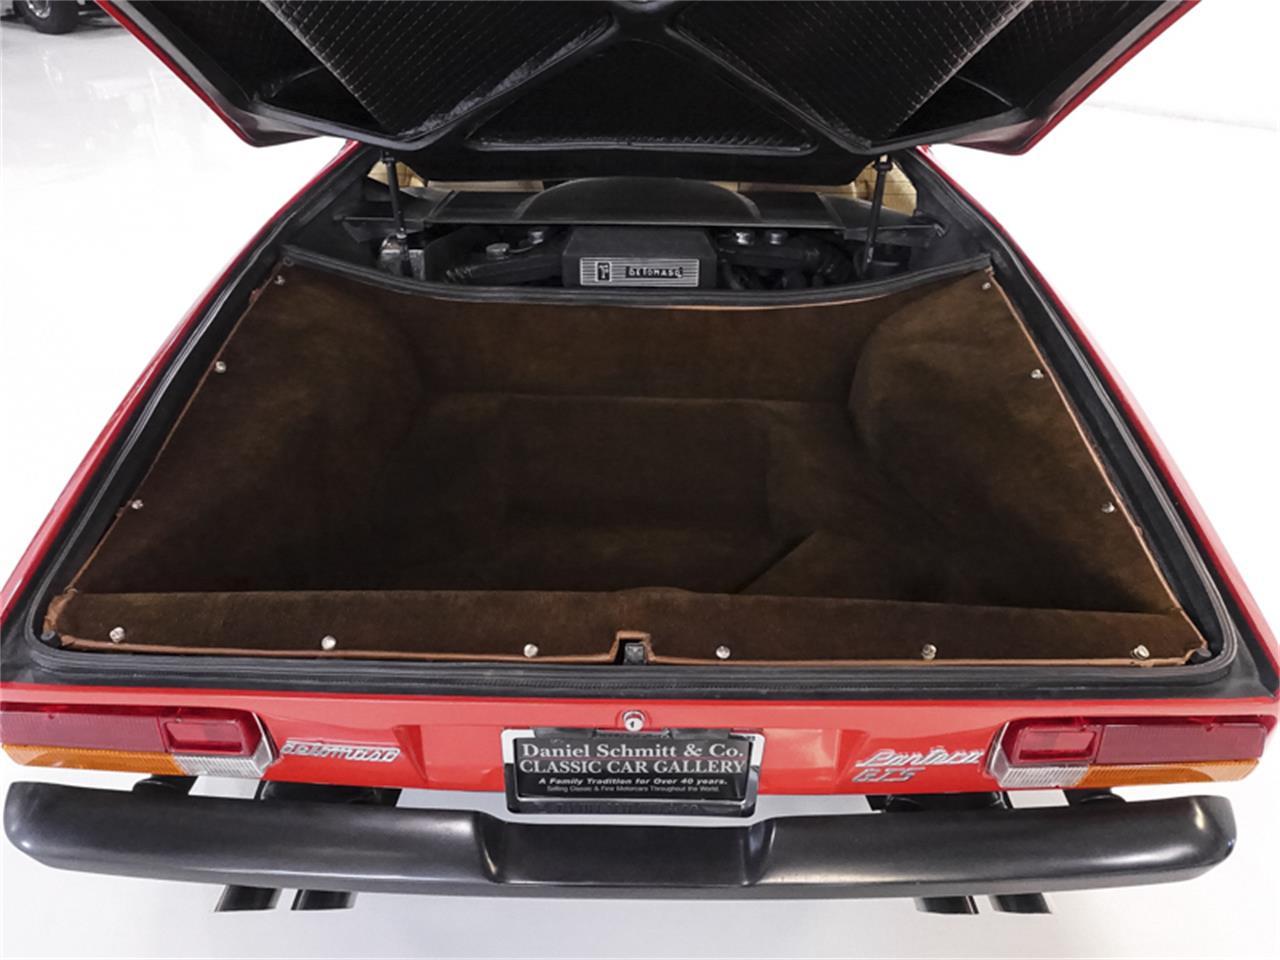 1983 De Tomaso Pantera (CC-1159437) for sale in Saint Louis, Missouri